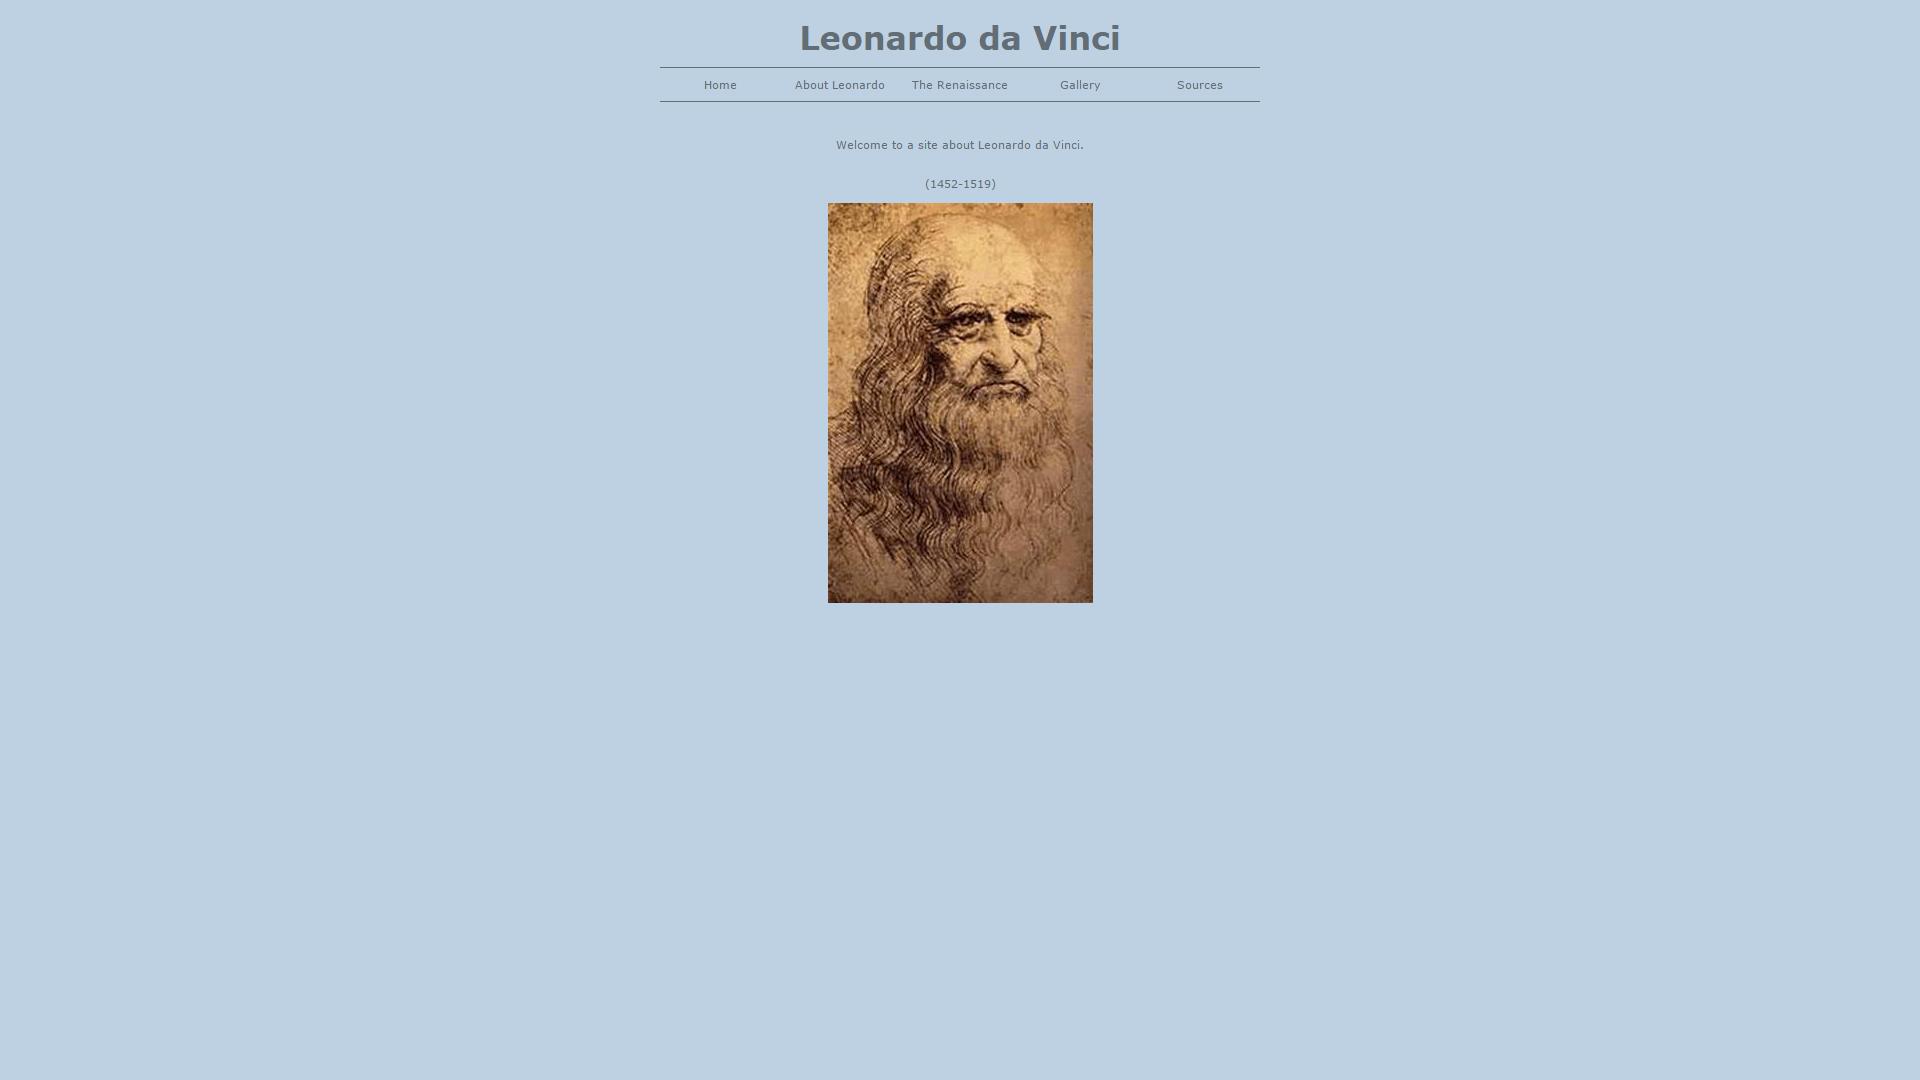 leonardo-da-vinci/assets/images/screenshot.png